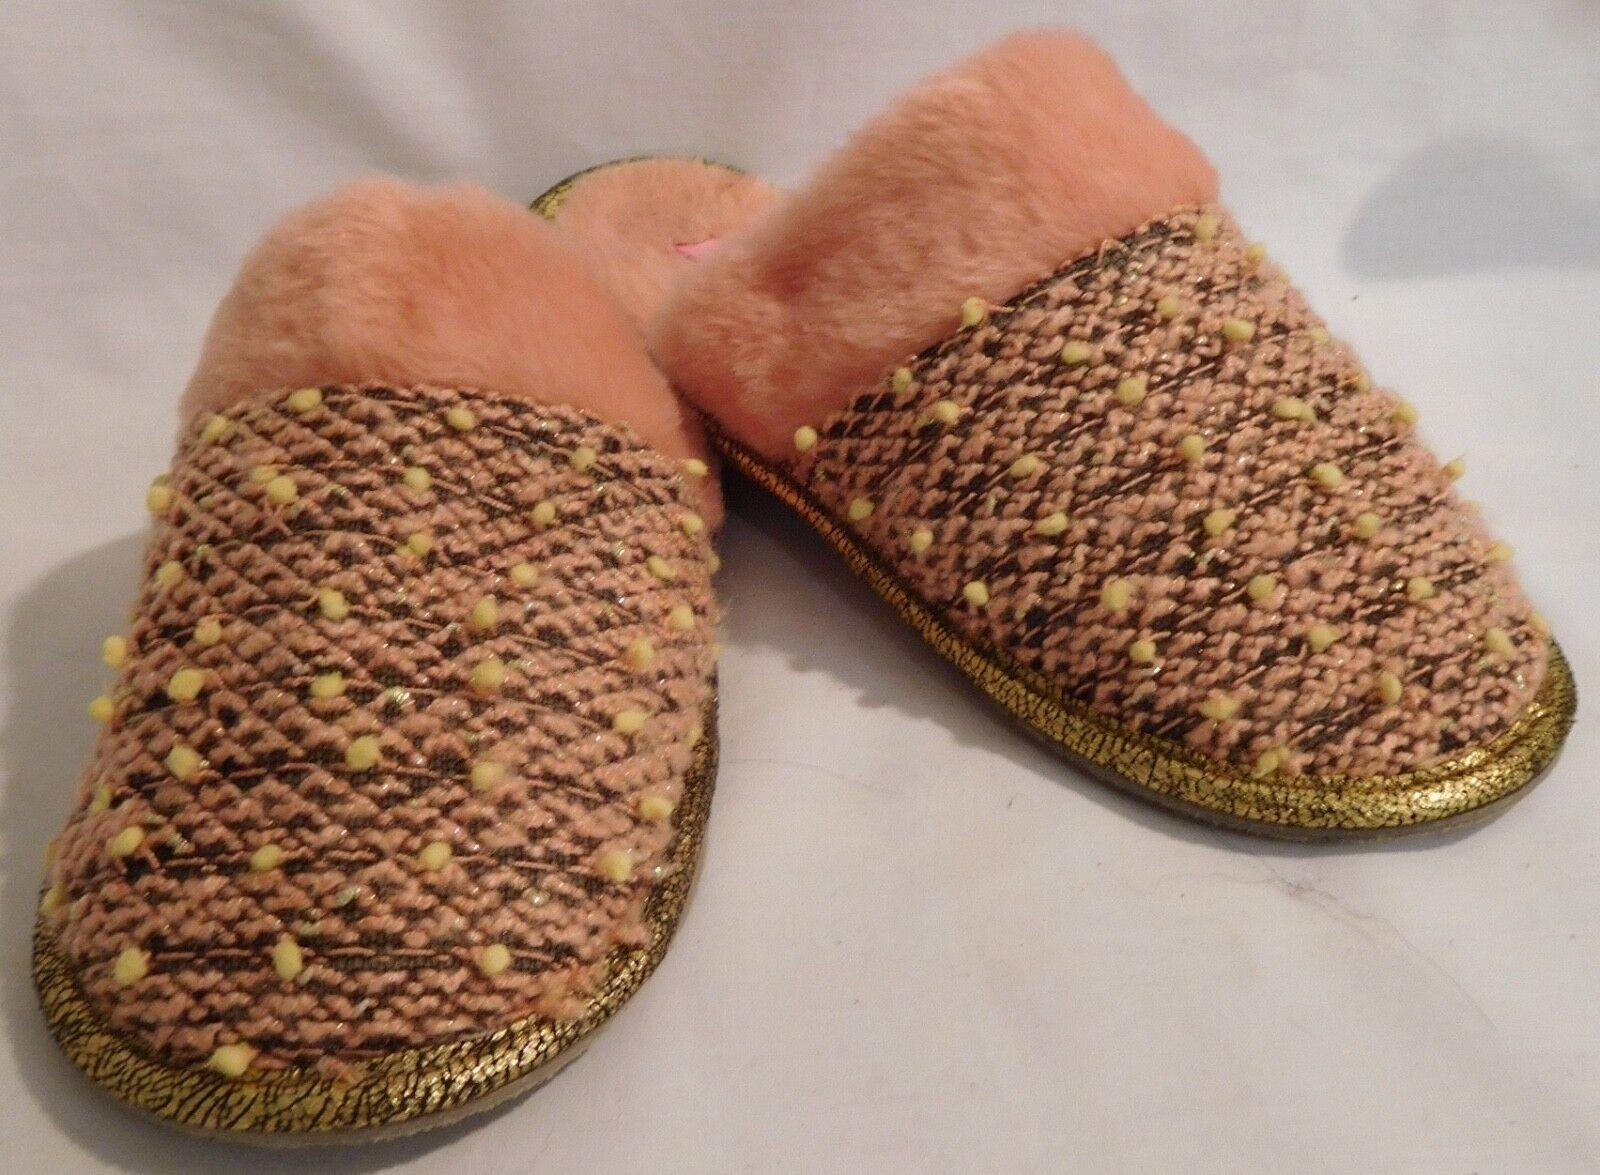 f1cd1b69d298 ISAAC MIZRAHI WOMENS PINK SLIPPERS WOMENS SIZE 10 TO 11 EUC XL MULE  ofywjo2114-Women s Slippers